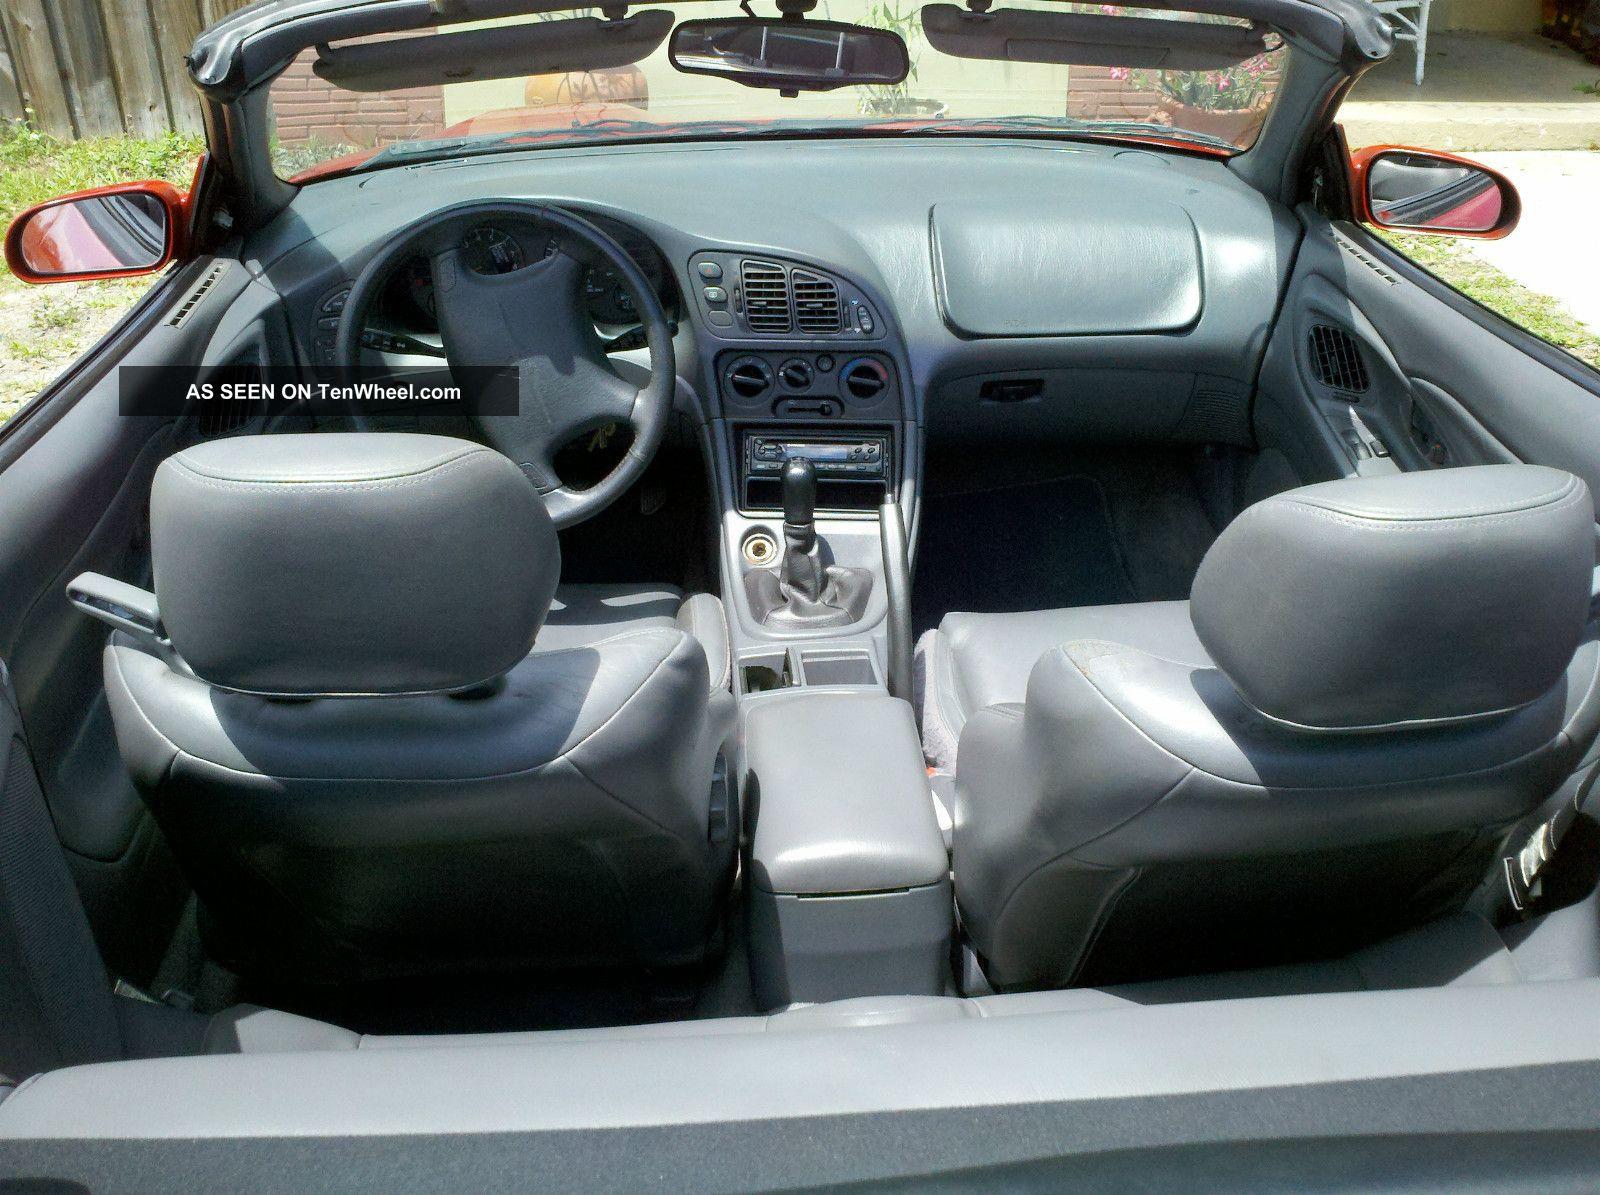 1996 Mitsubishi Eclipse Spyder Gst Convertible 2 Door 2 0l